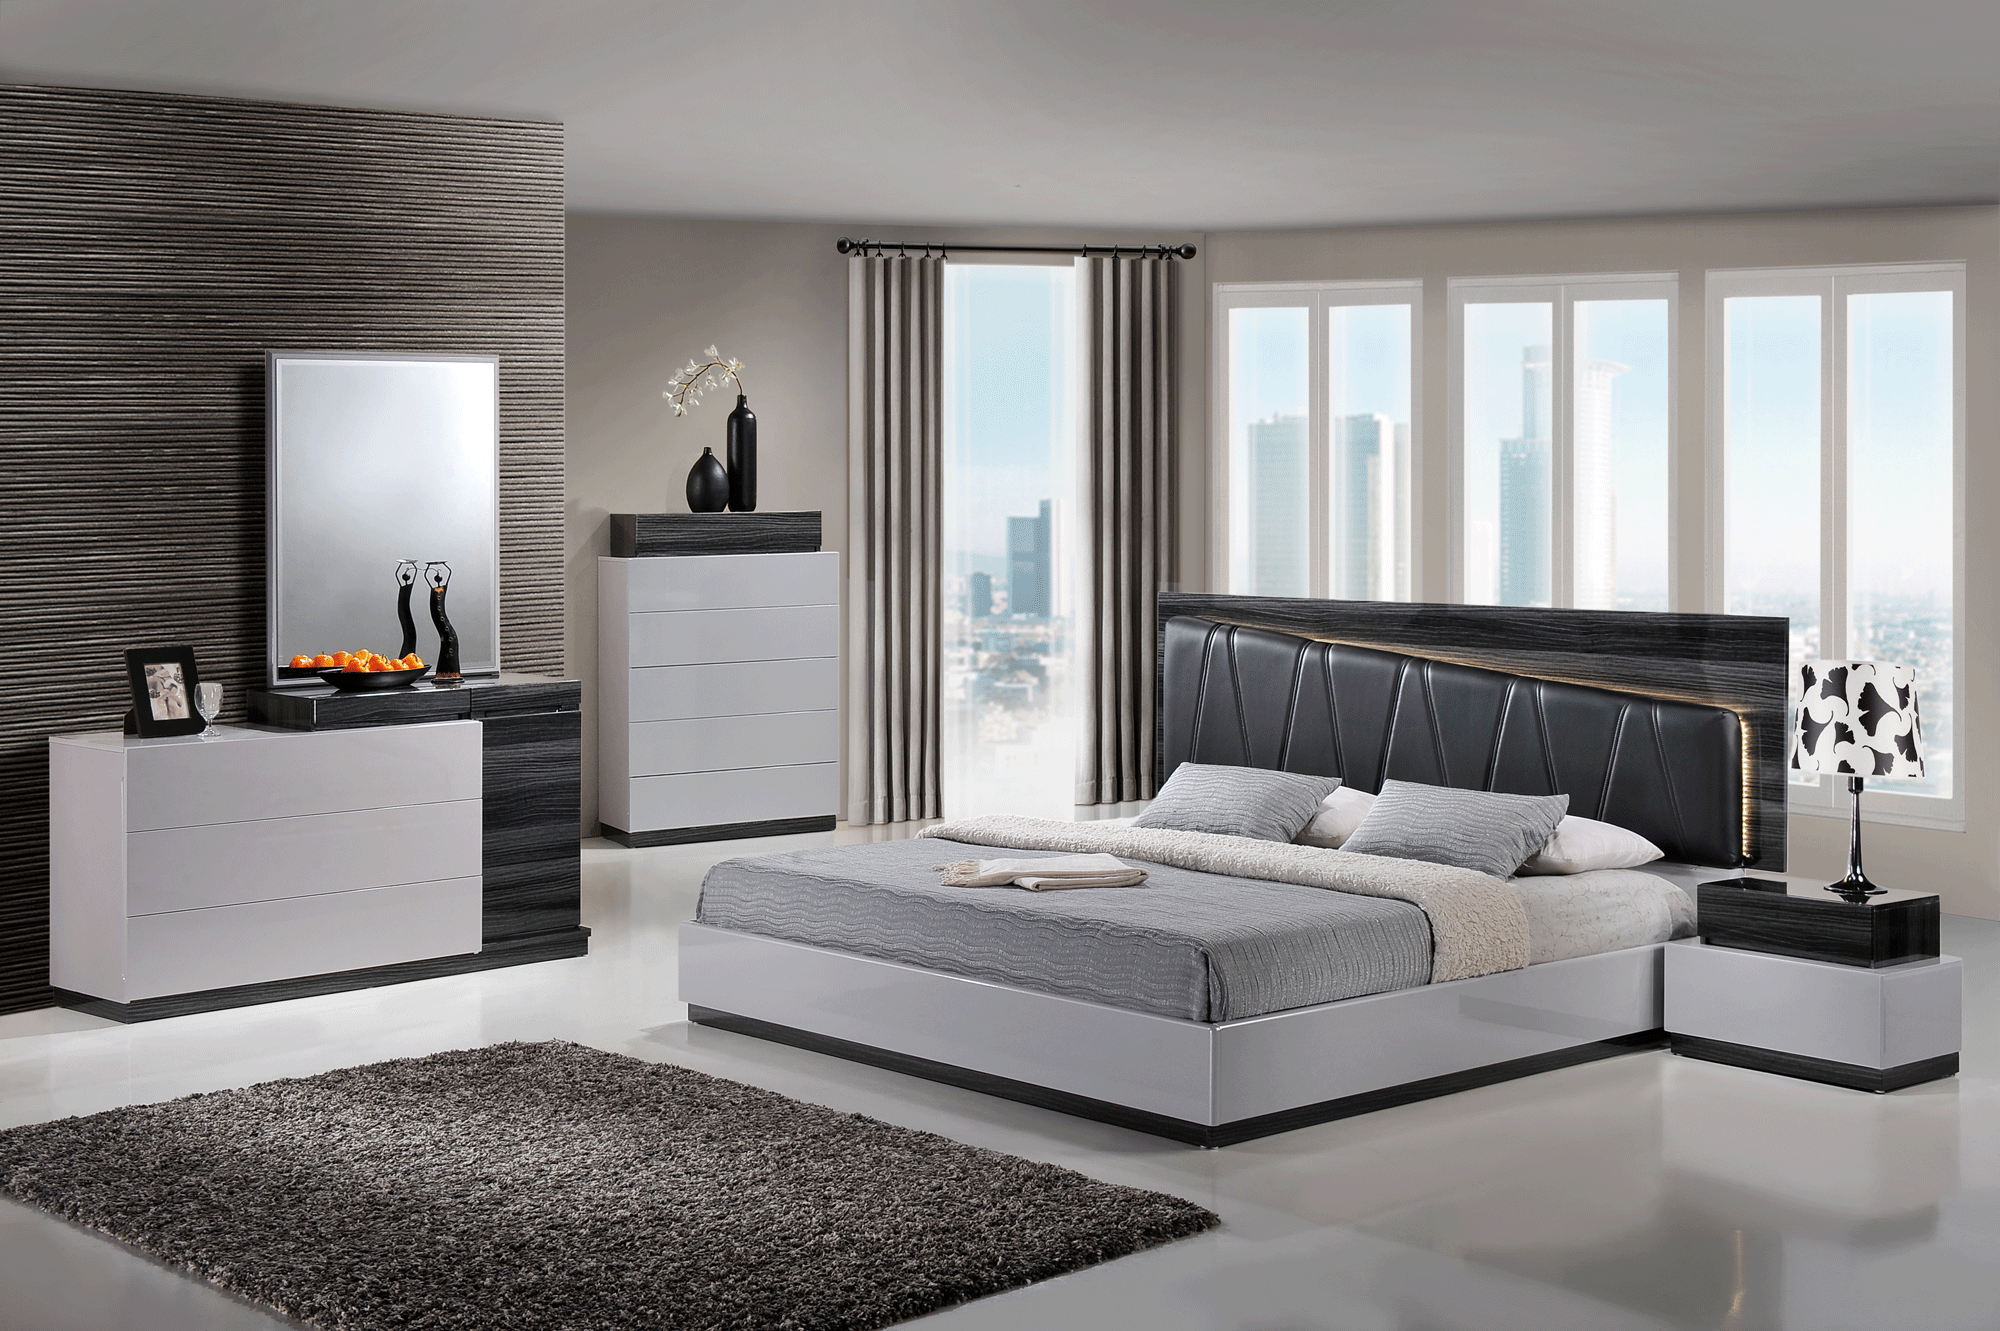 Lexi Silver Line & Zebra Grey Black PU Bedroom Set by Global Furniture